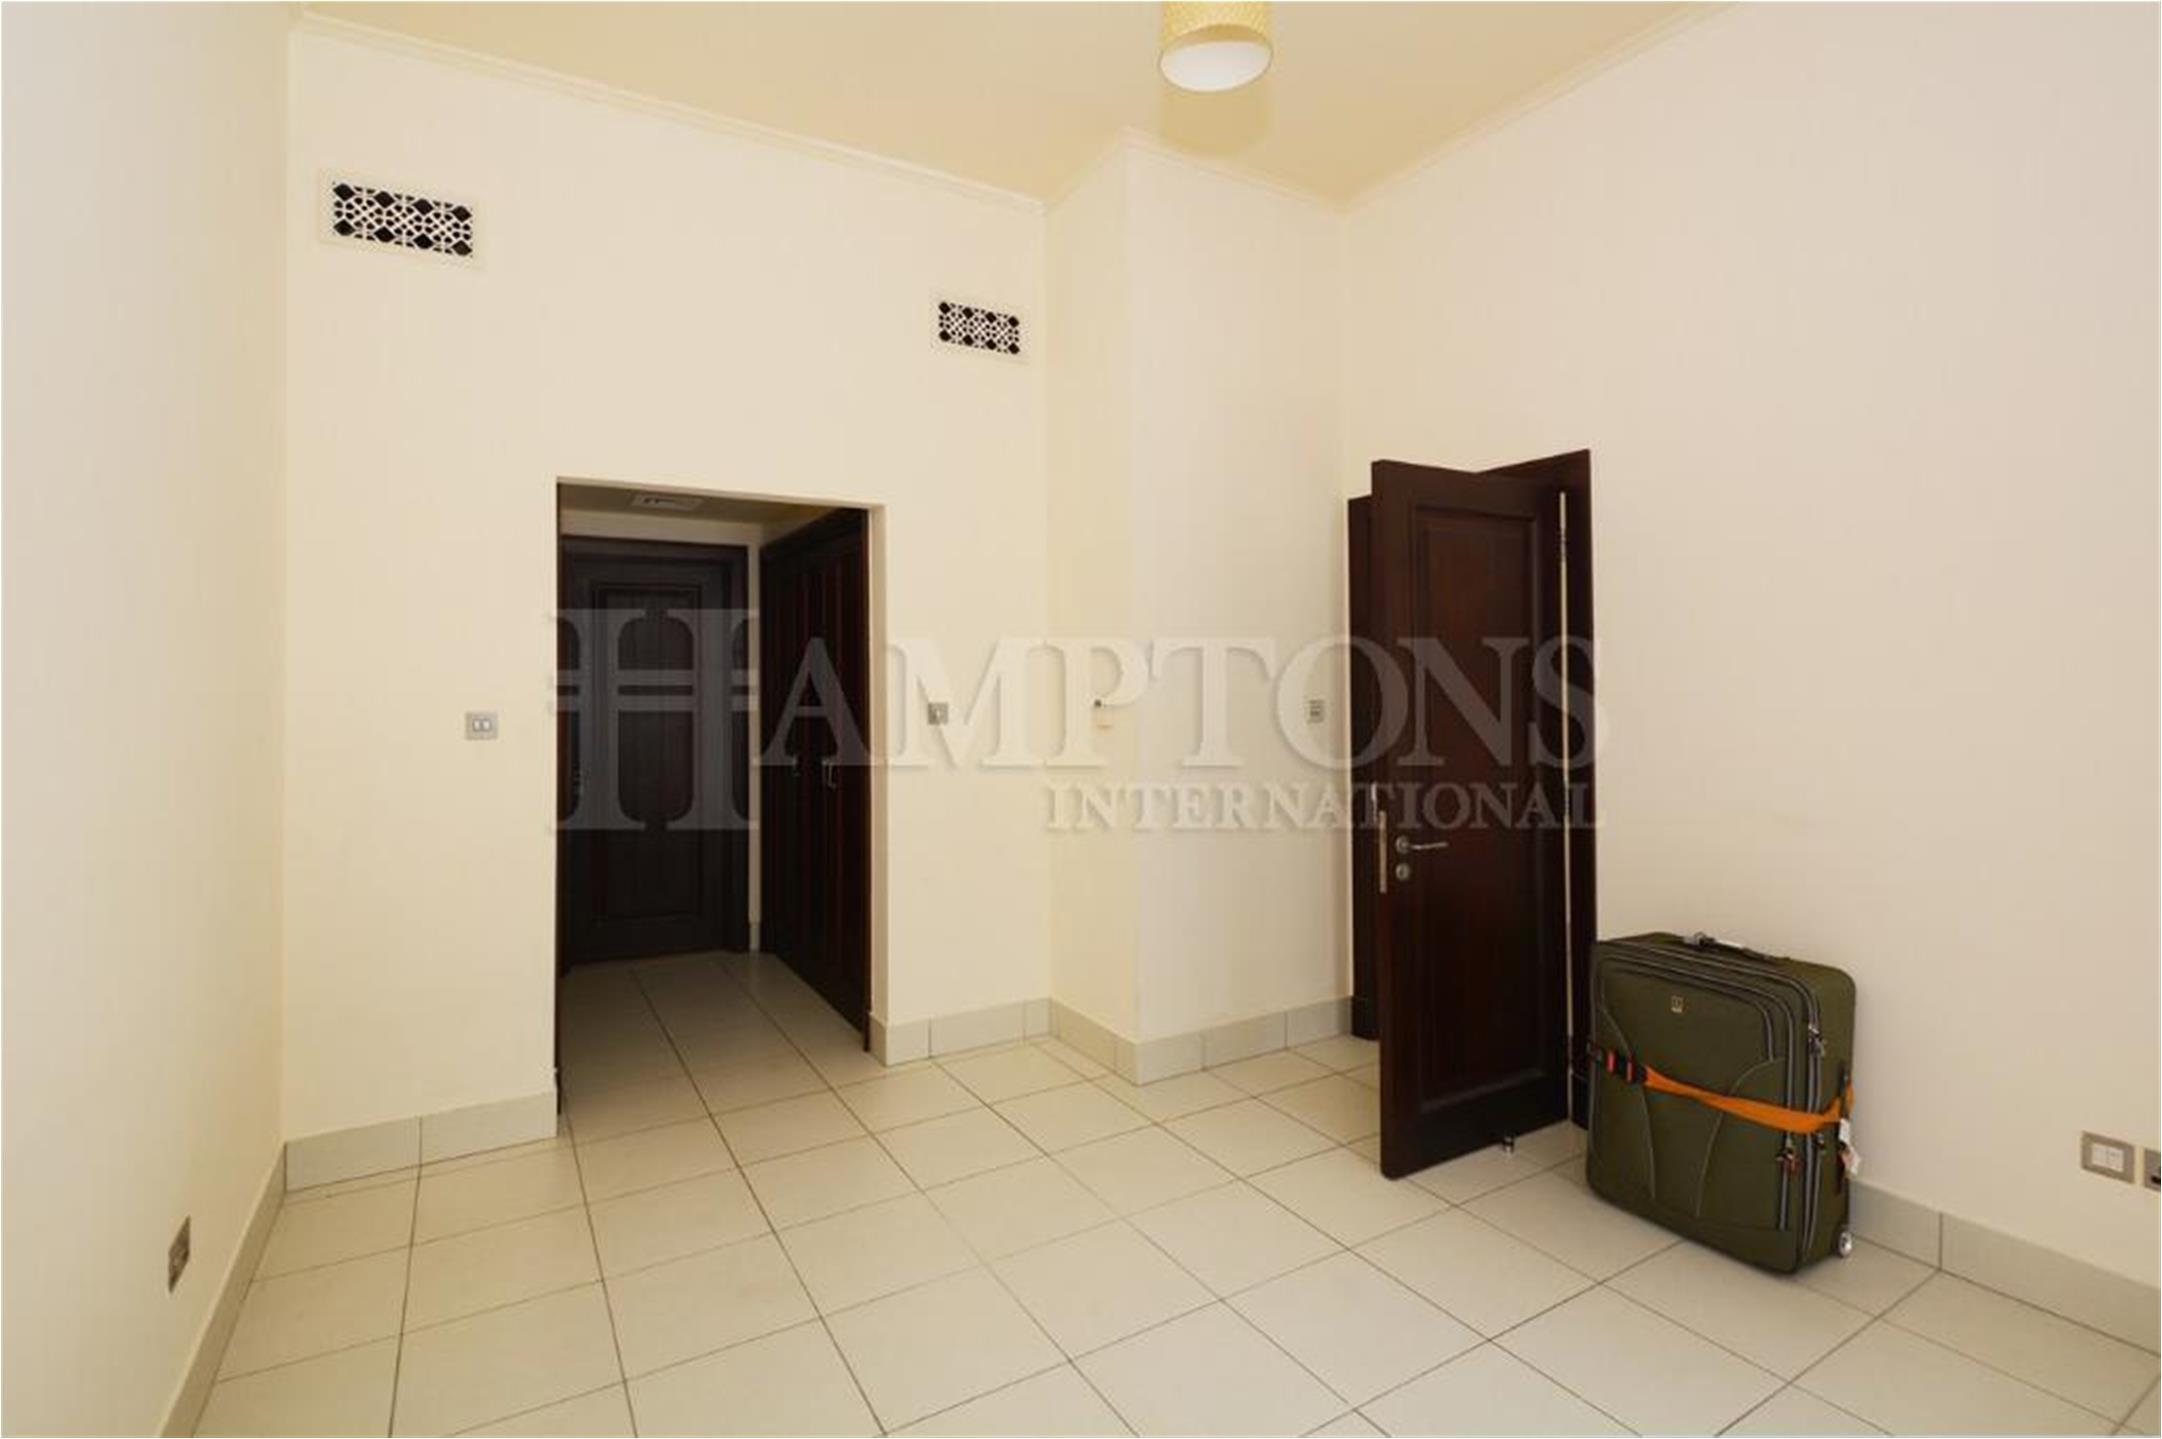 2 bedroom apartment for rent in zaafaran 2 old town dubai uae especially splendid interior trends